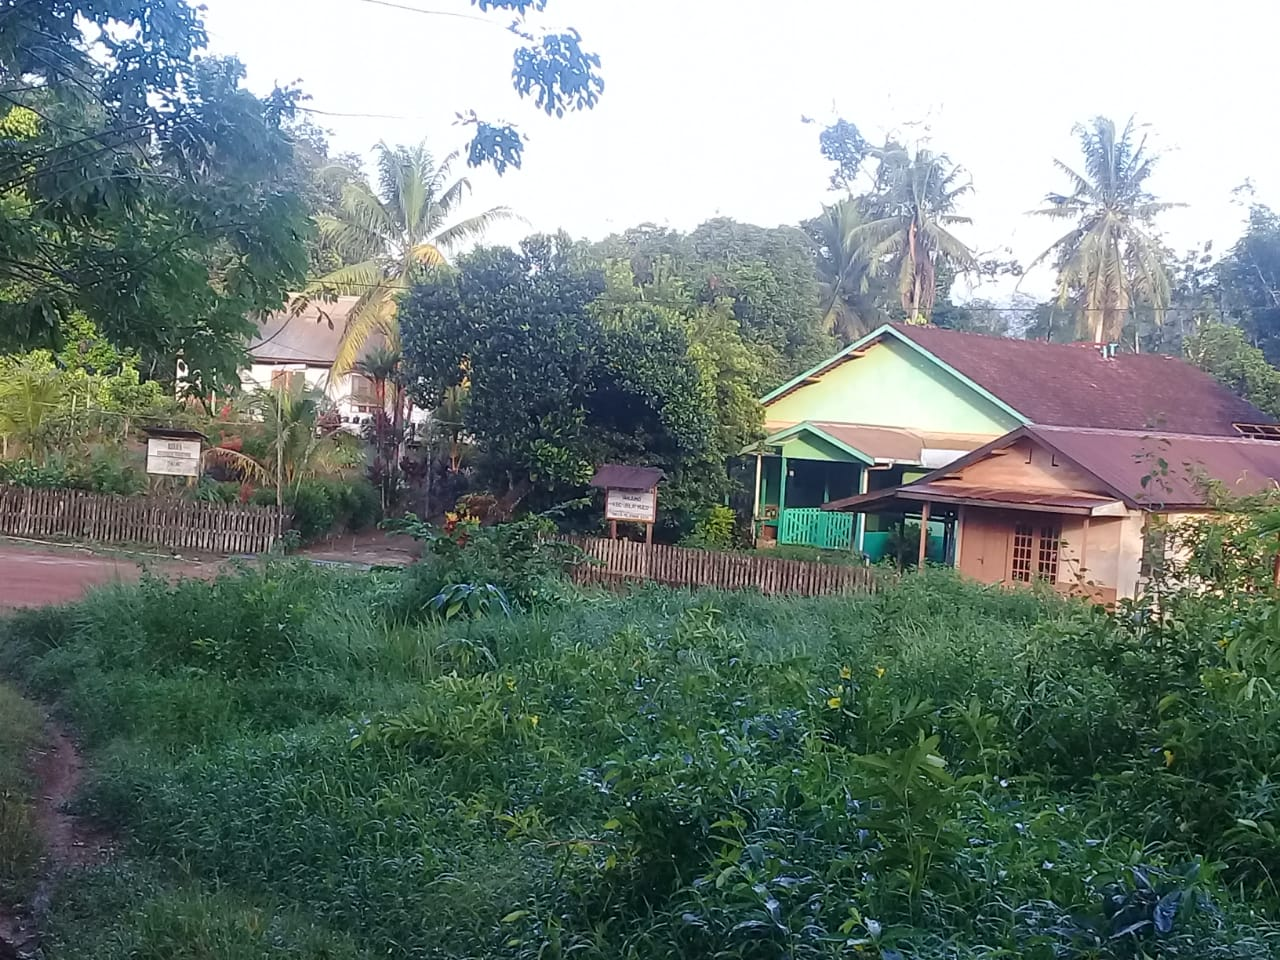 Indonesia: S. Elisa Petra